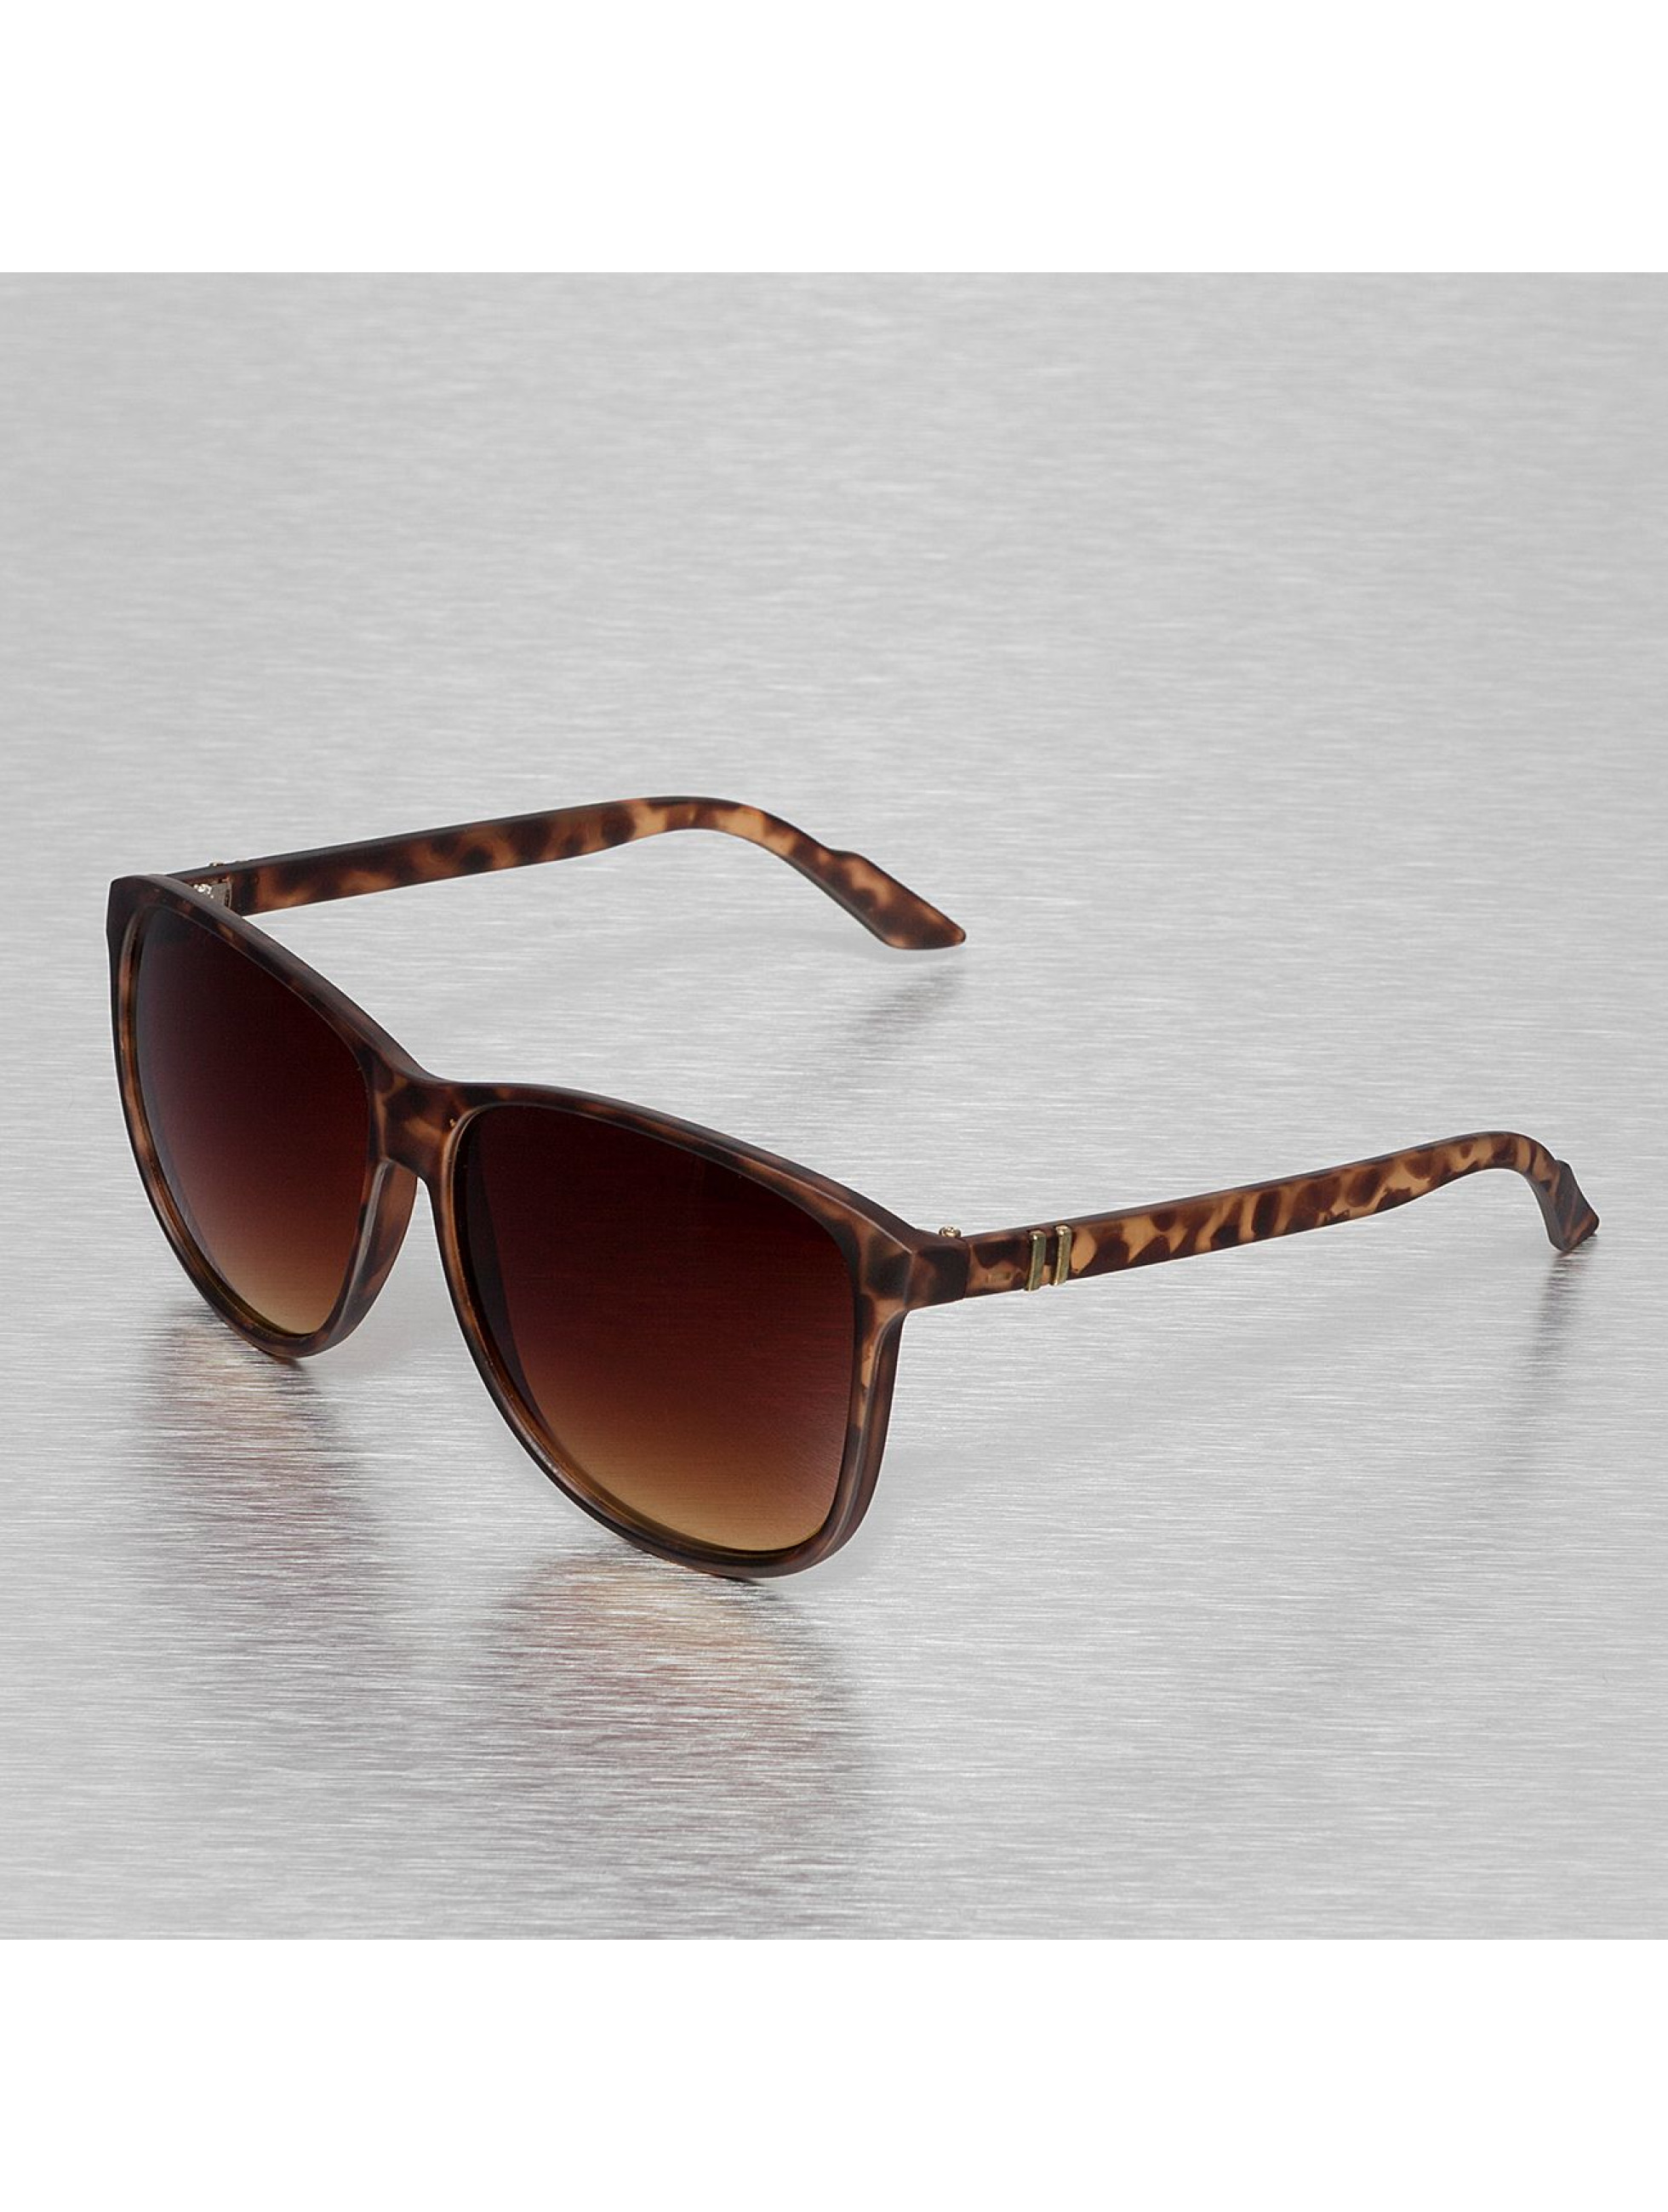 MSTRDS Lunettes de soleil Chirwa brun